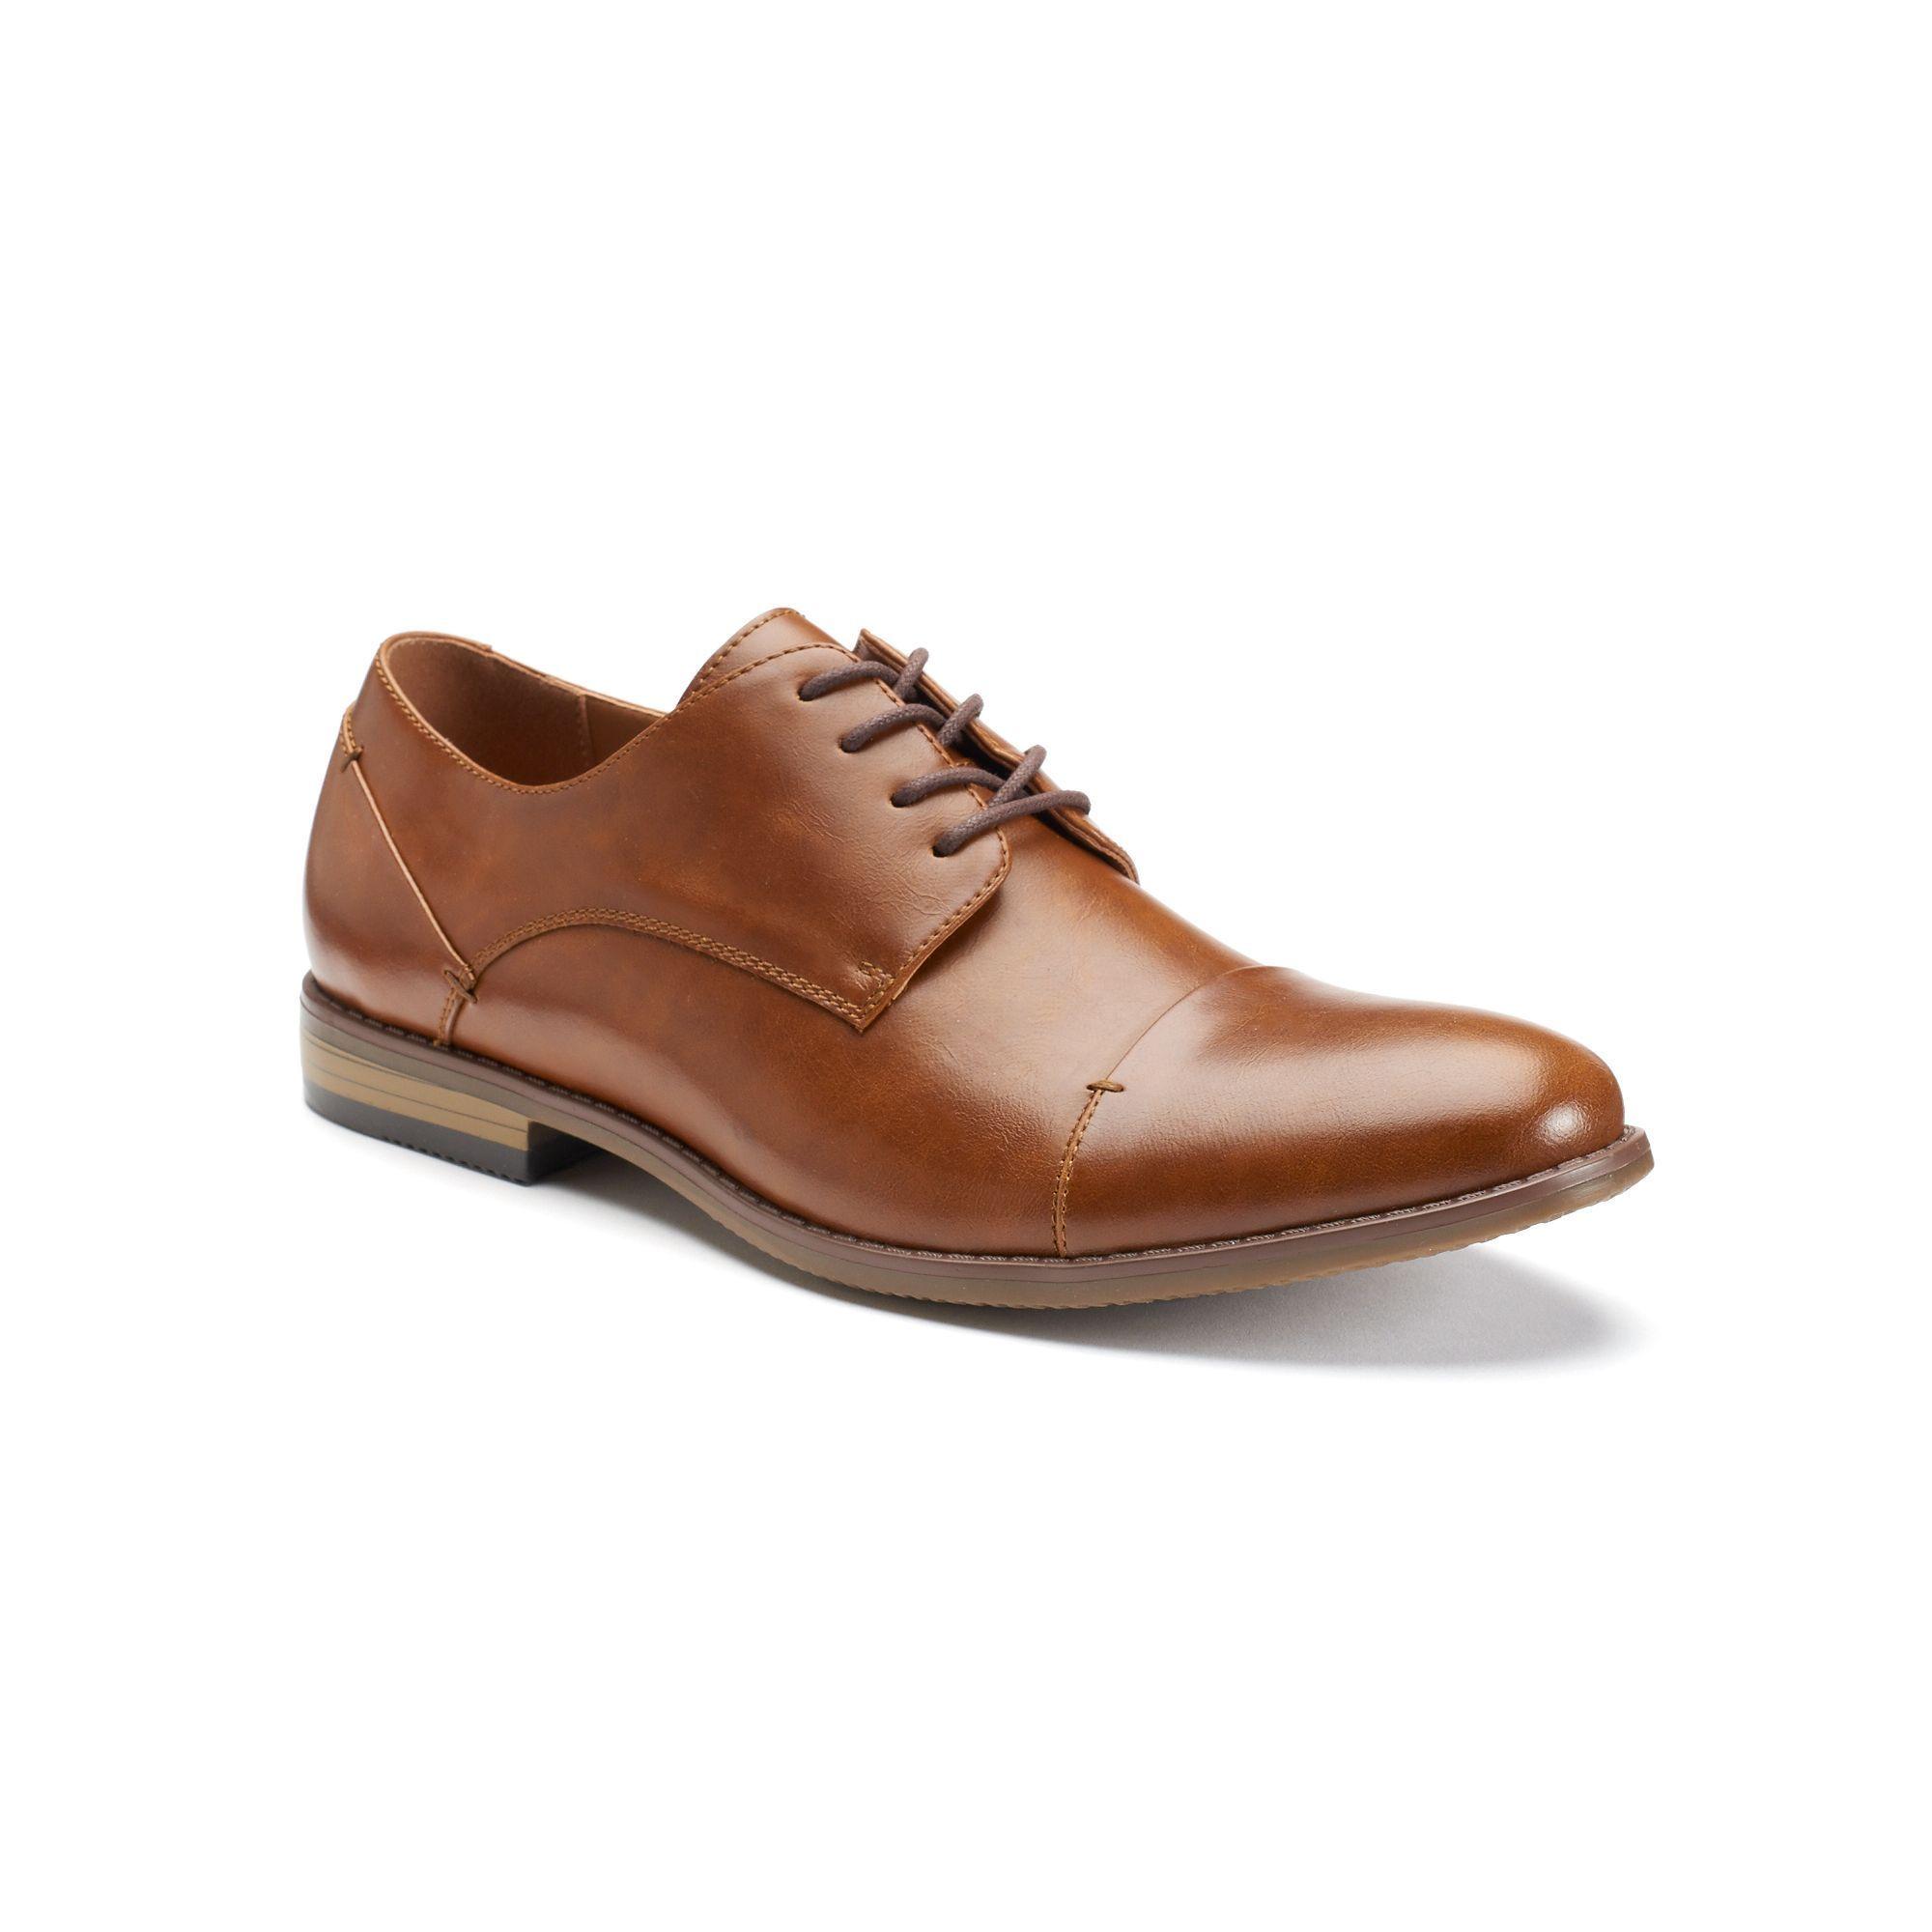 SONOMA Brendan Men/'s Dress Shoes  Oxfords  Black  Lace Up  Formal  Medium  NEW